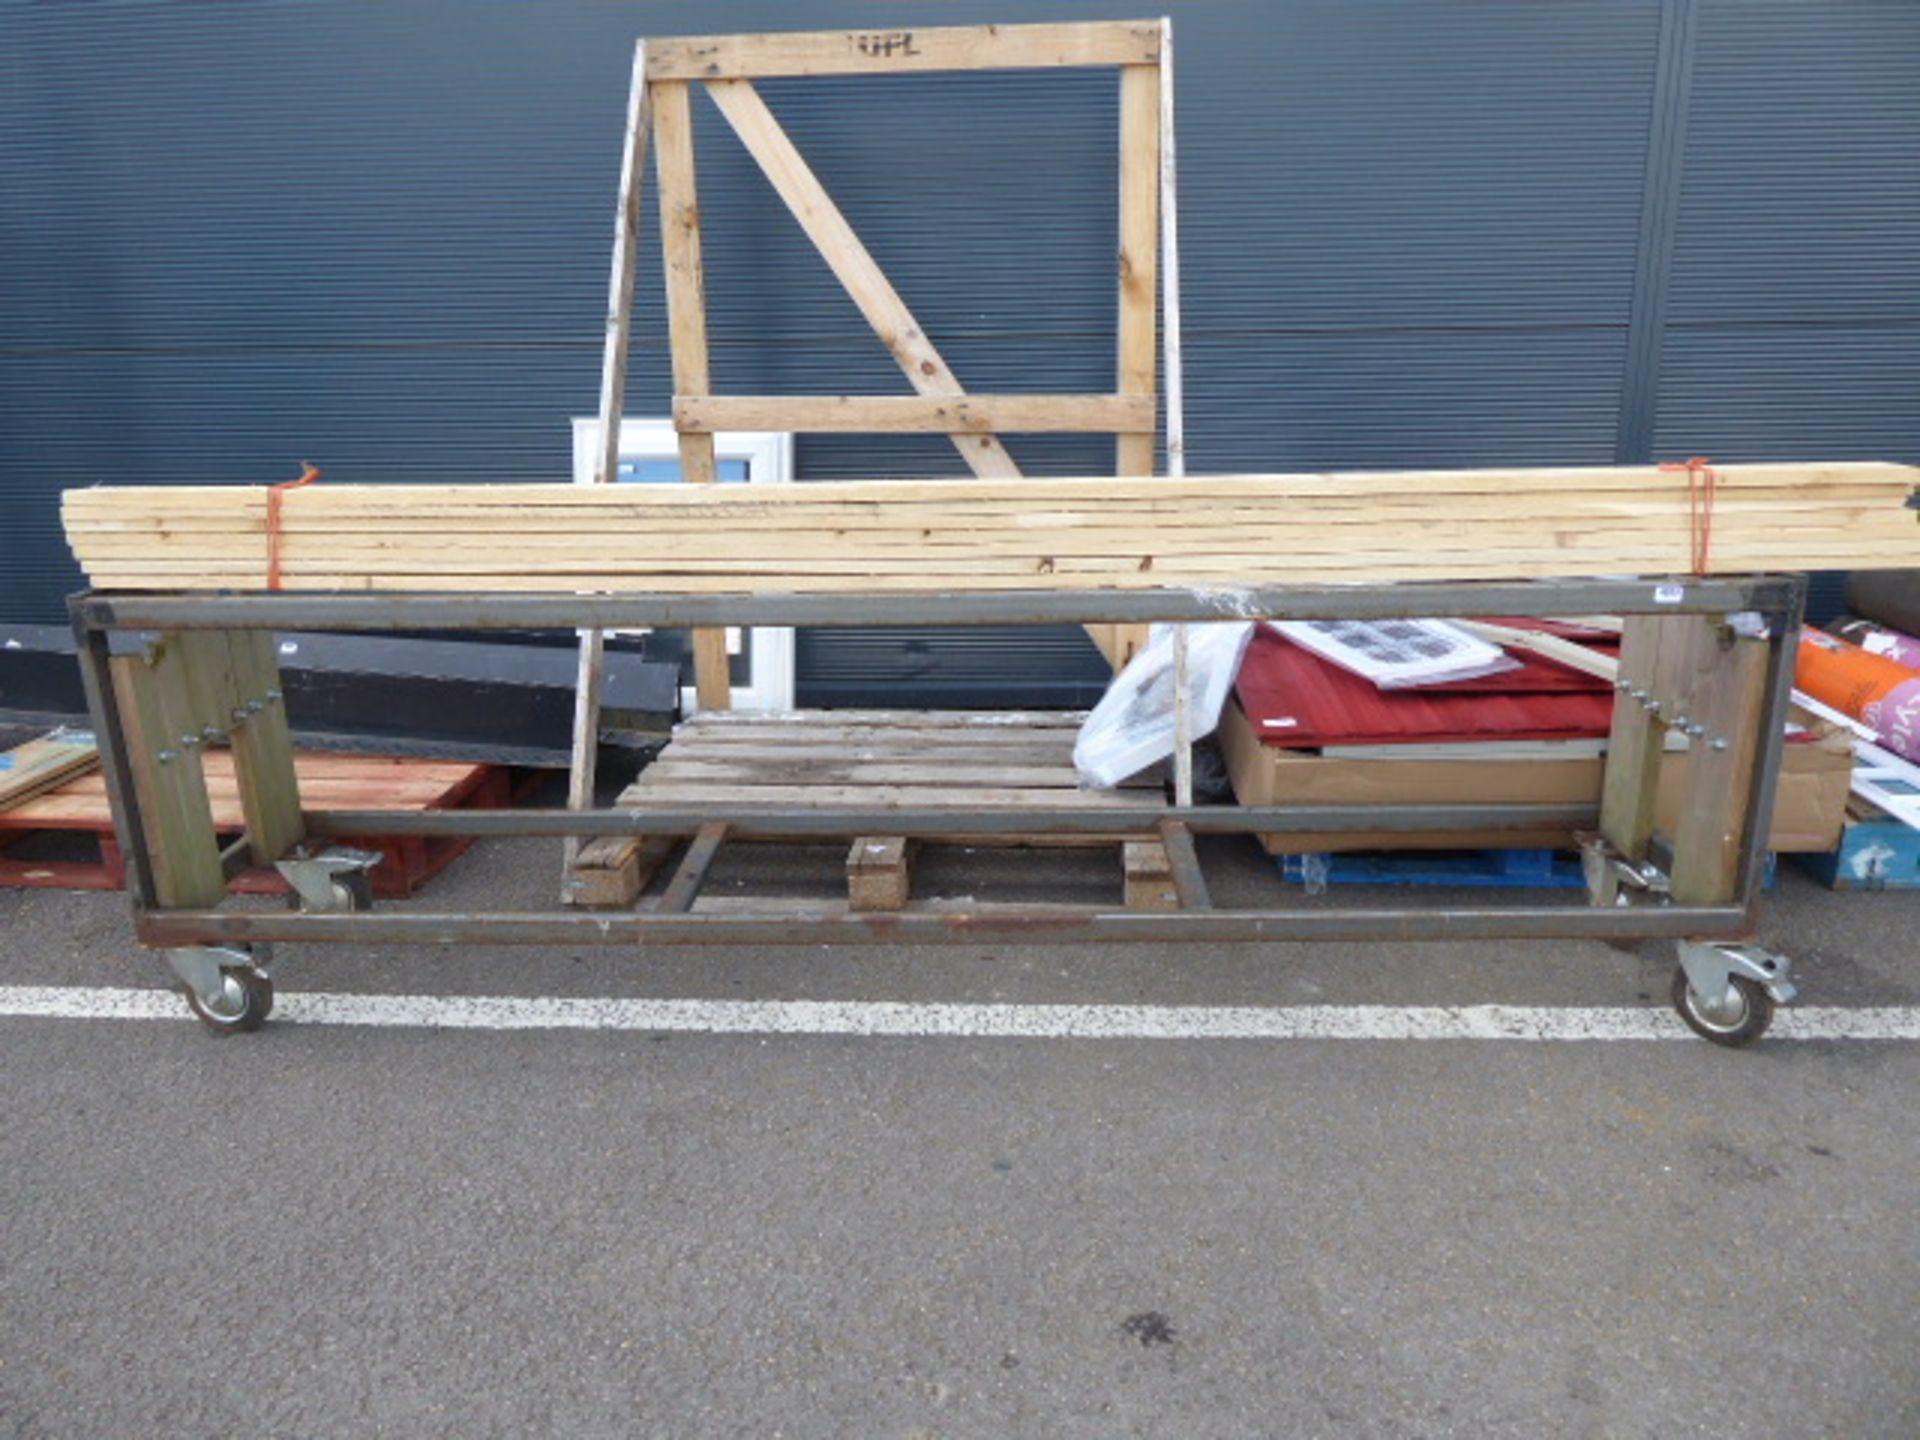 Lot 4383 - 4 wheel metal frame trolley